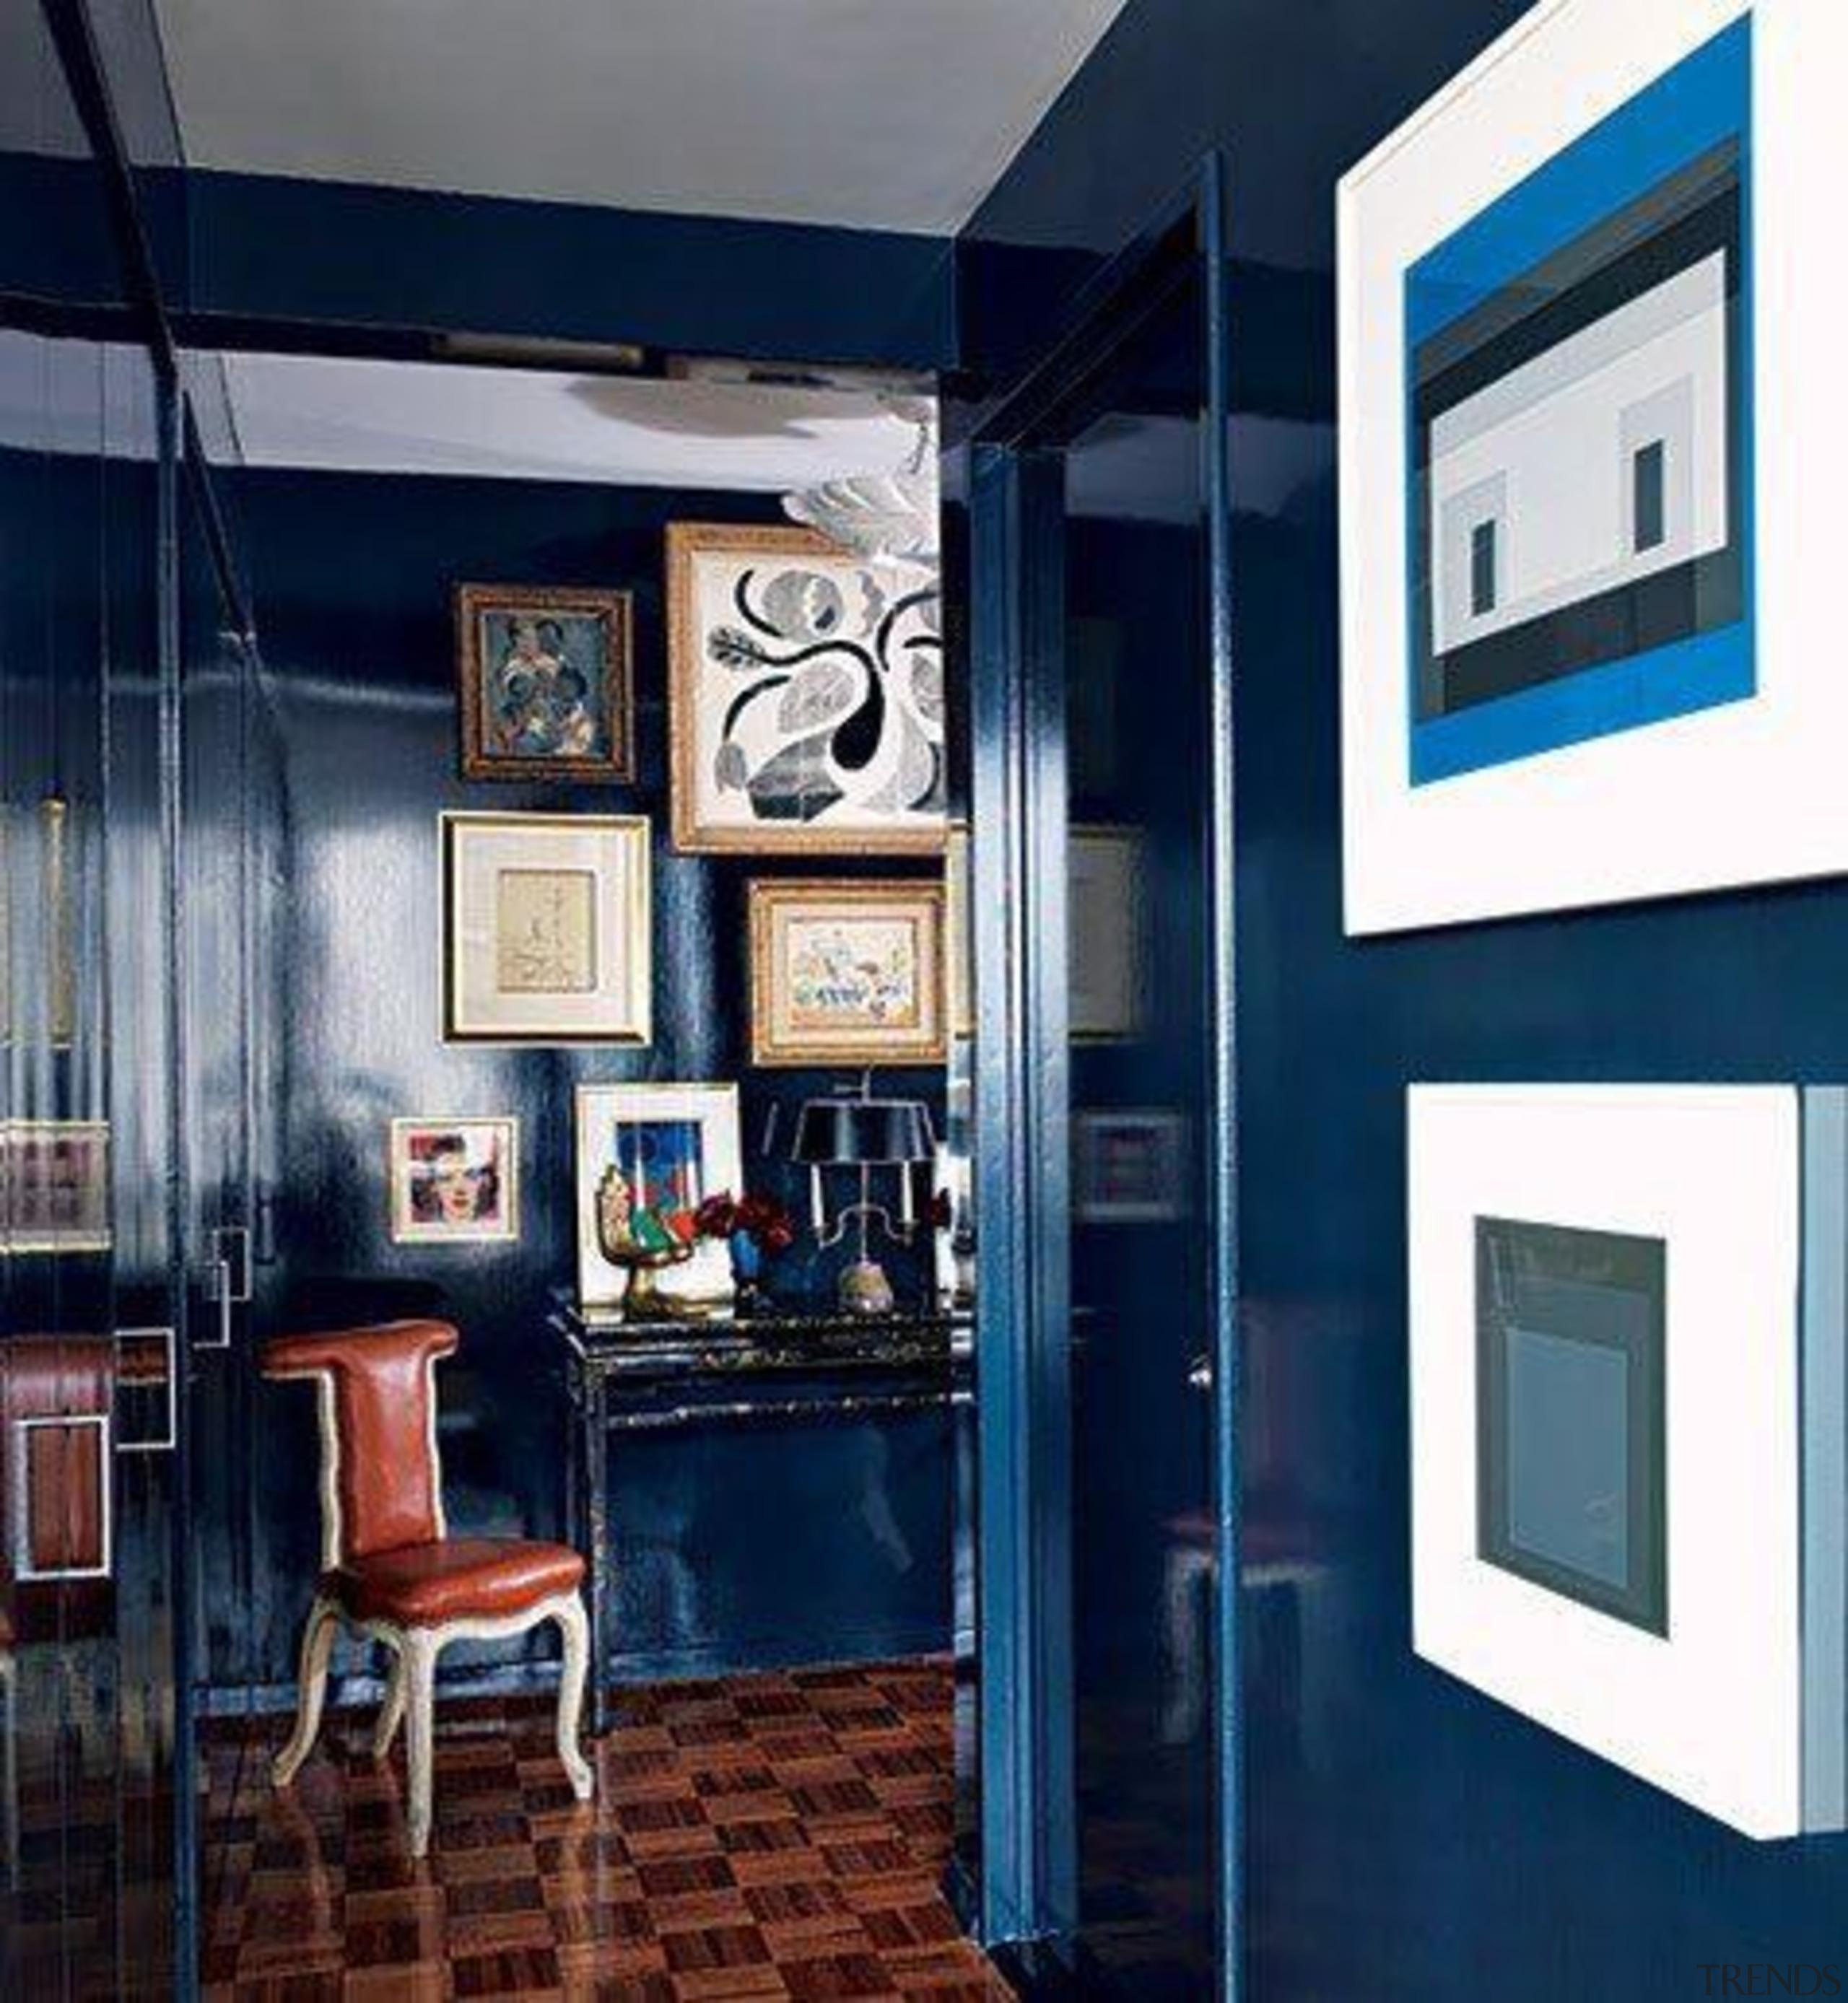 cerulean  elementsofstyleblogcom.jpg - cerulean__elementsofstyleblogcom.jpg - ceiling   ceiling, interior design, room, wall, blue